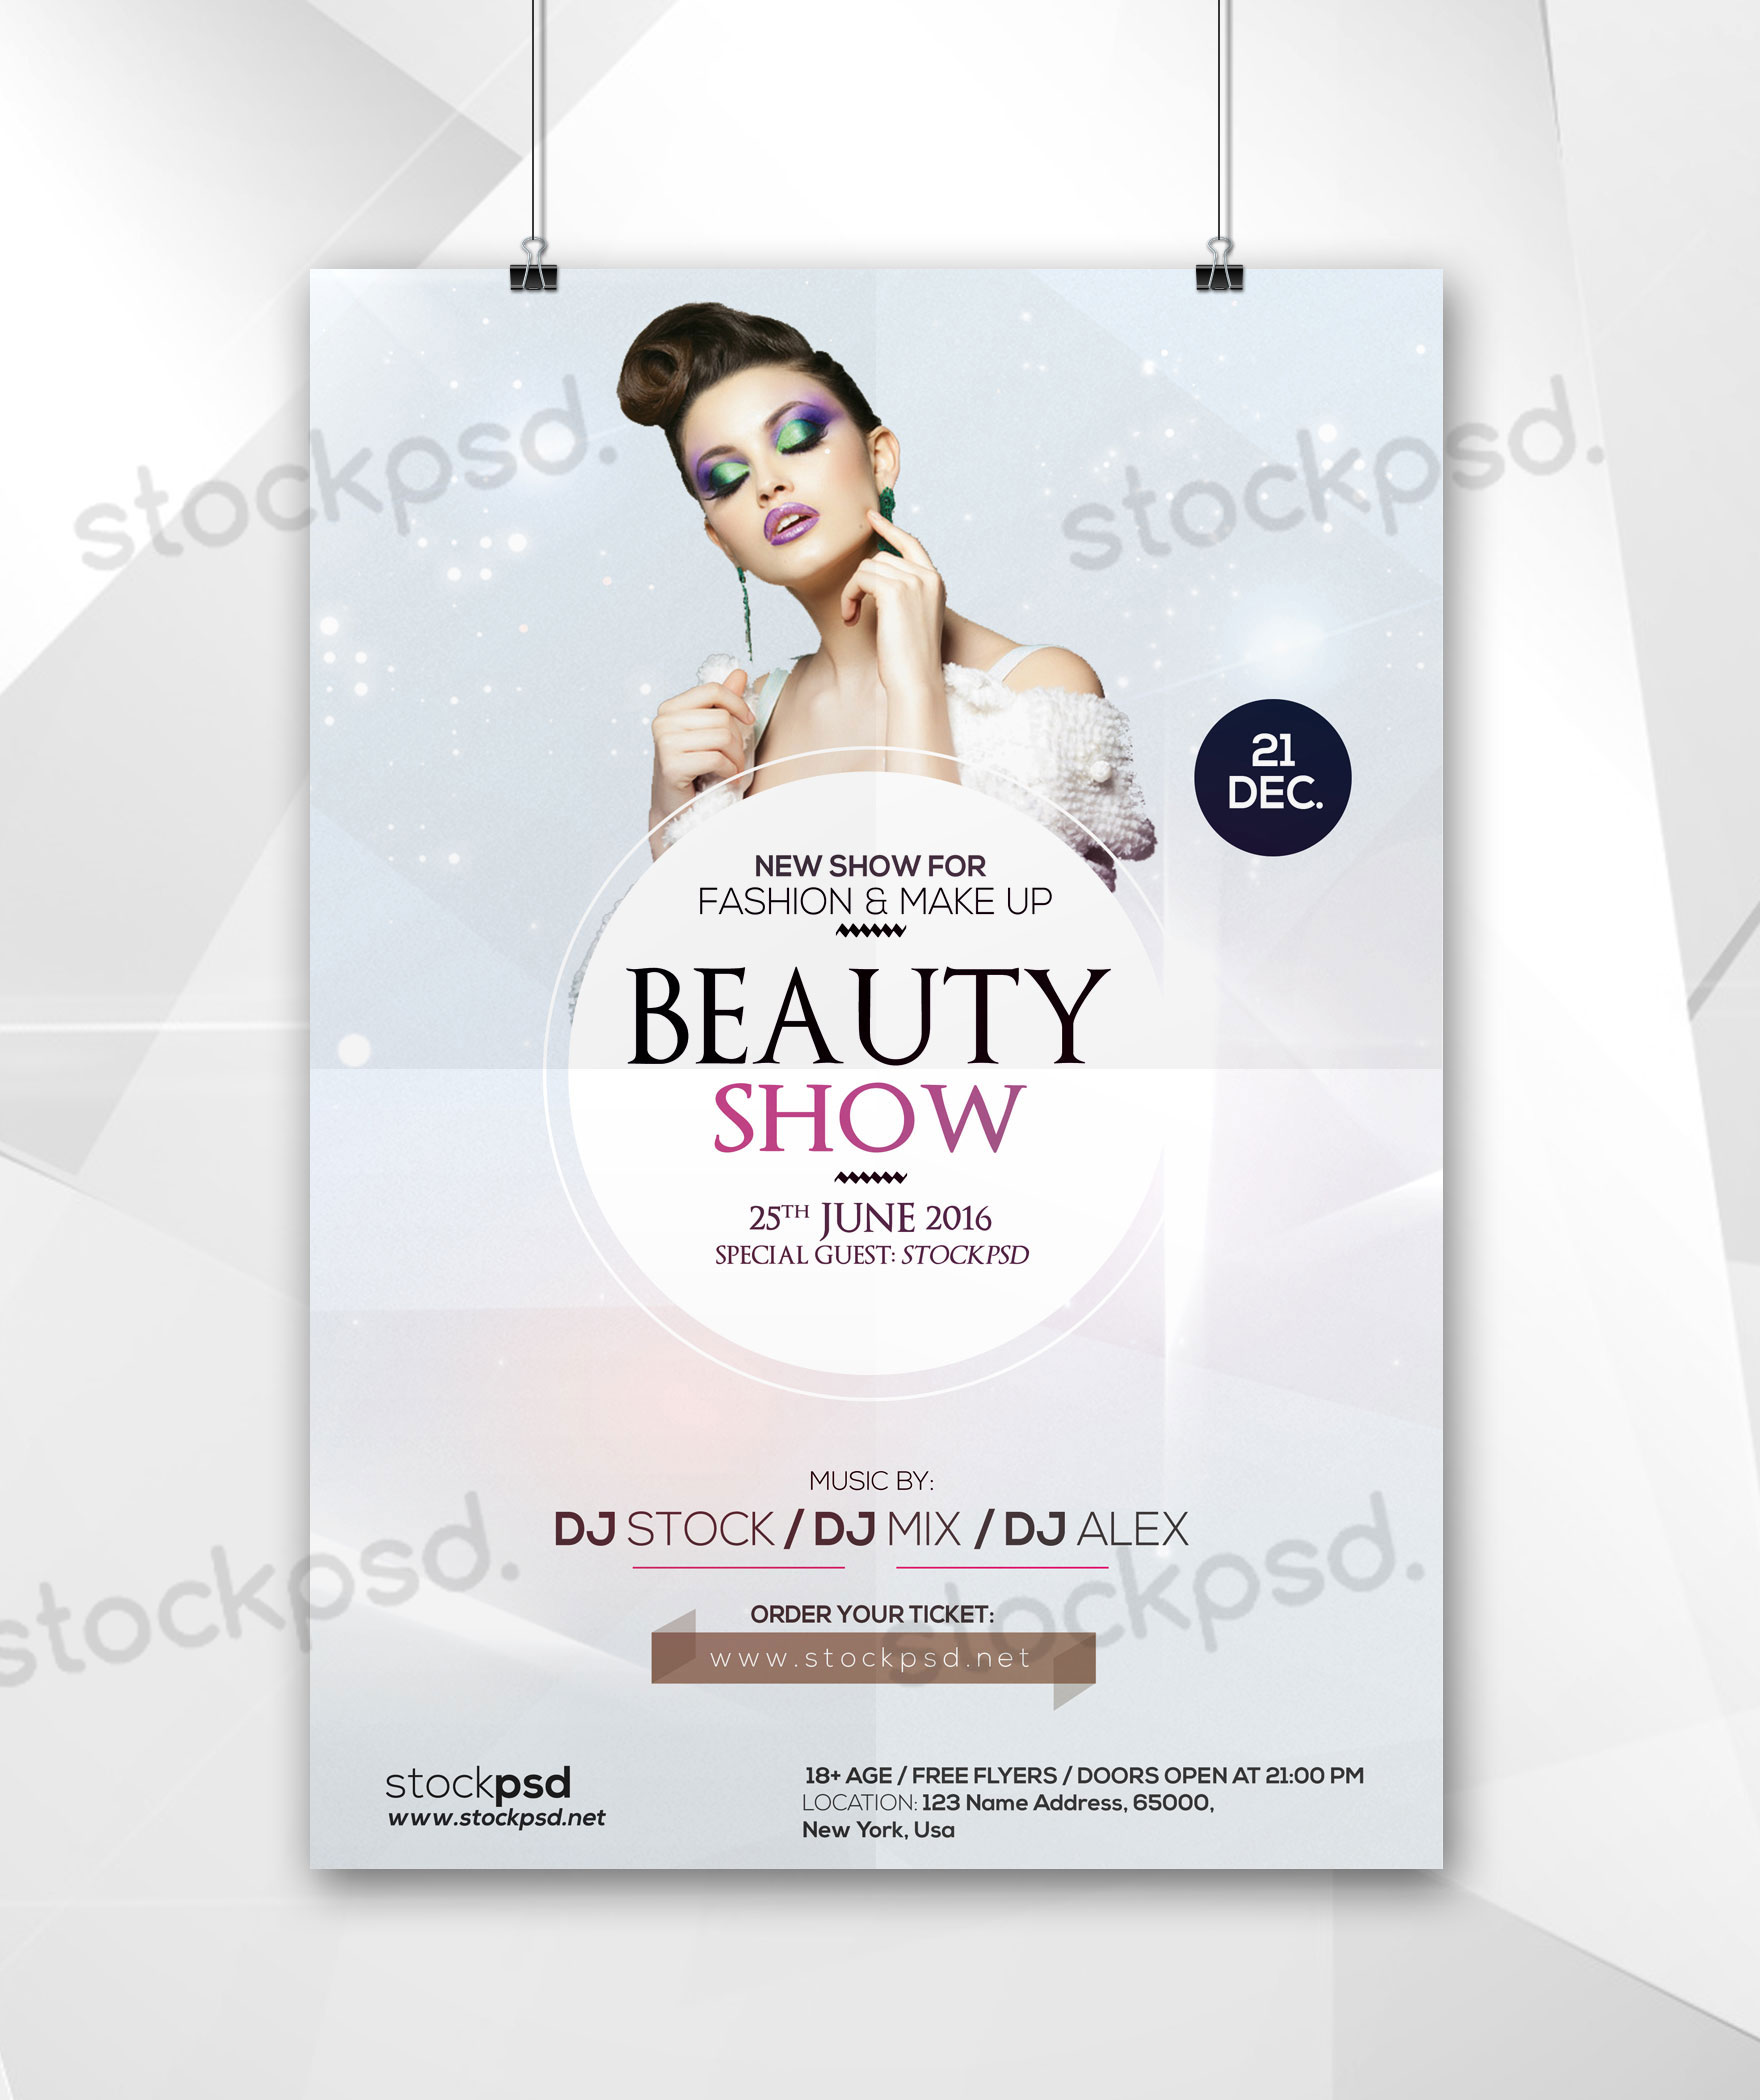 Beauty Show – Free Minimal PSD Flyer